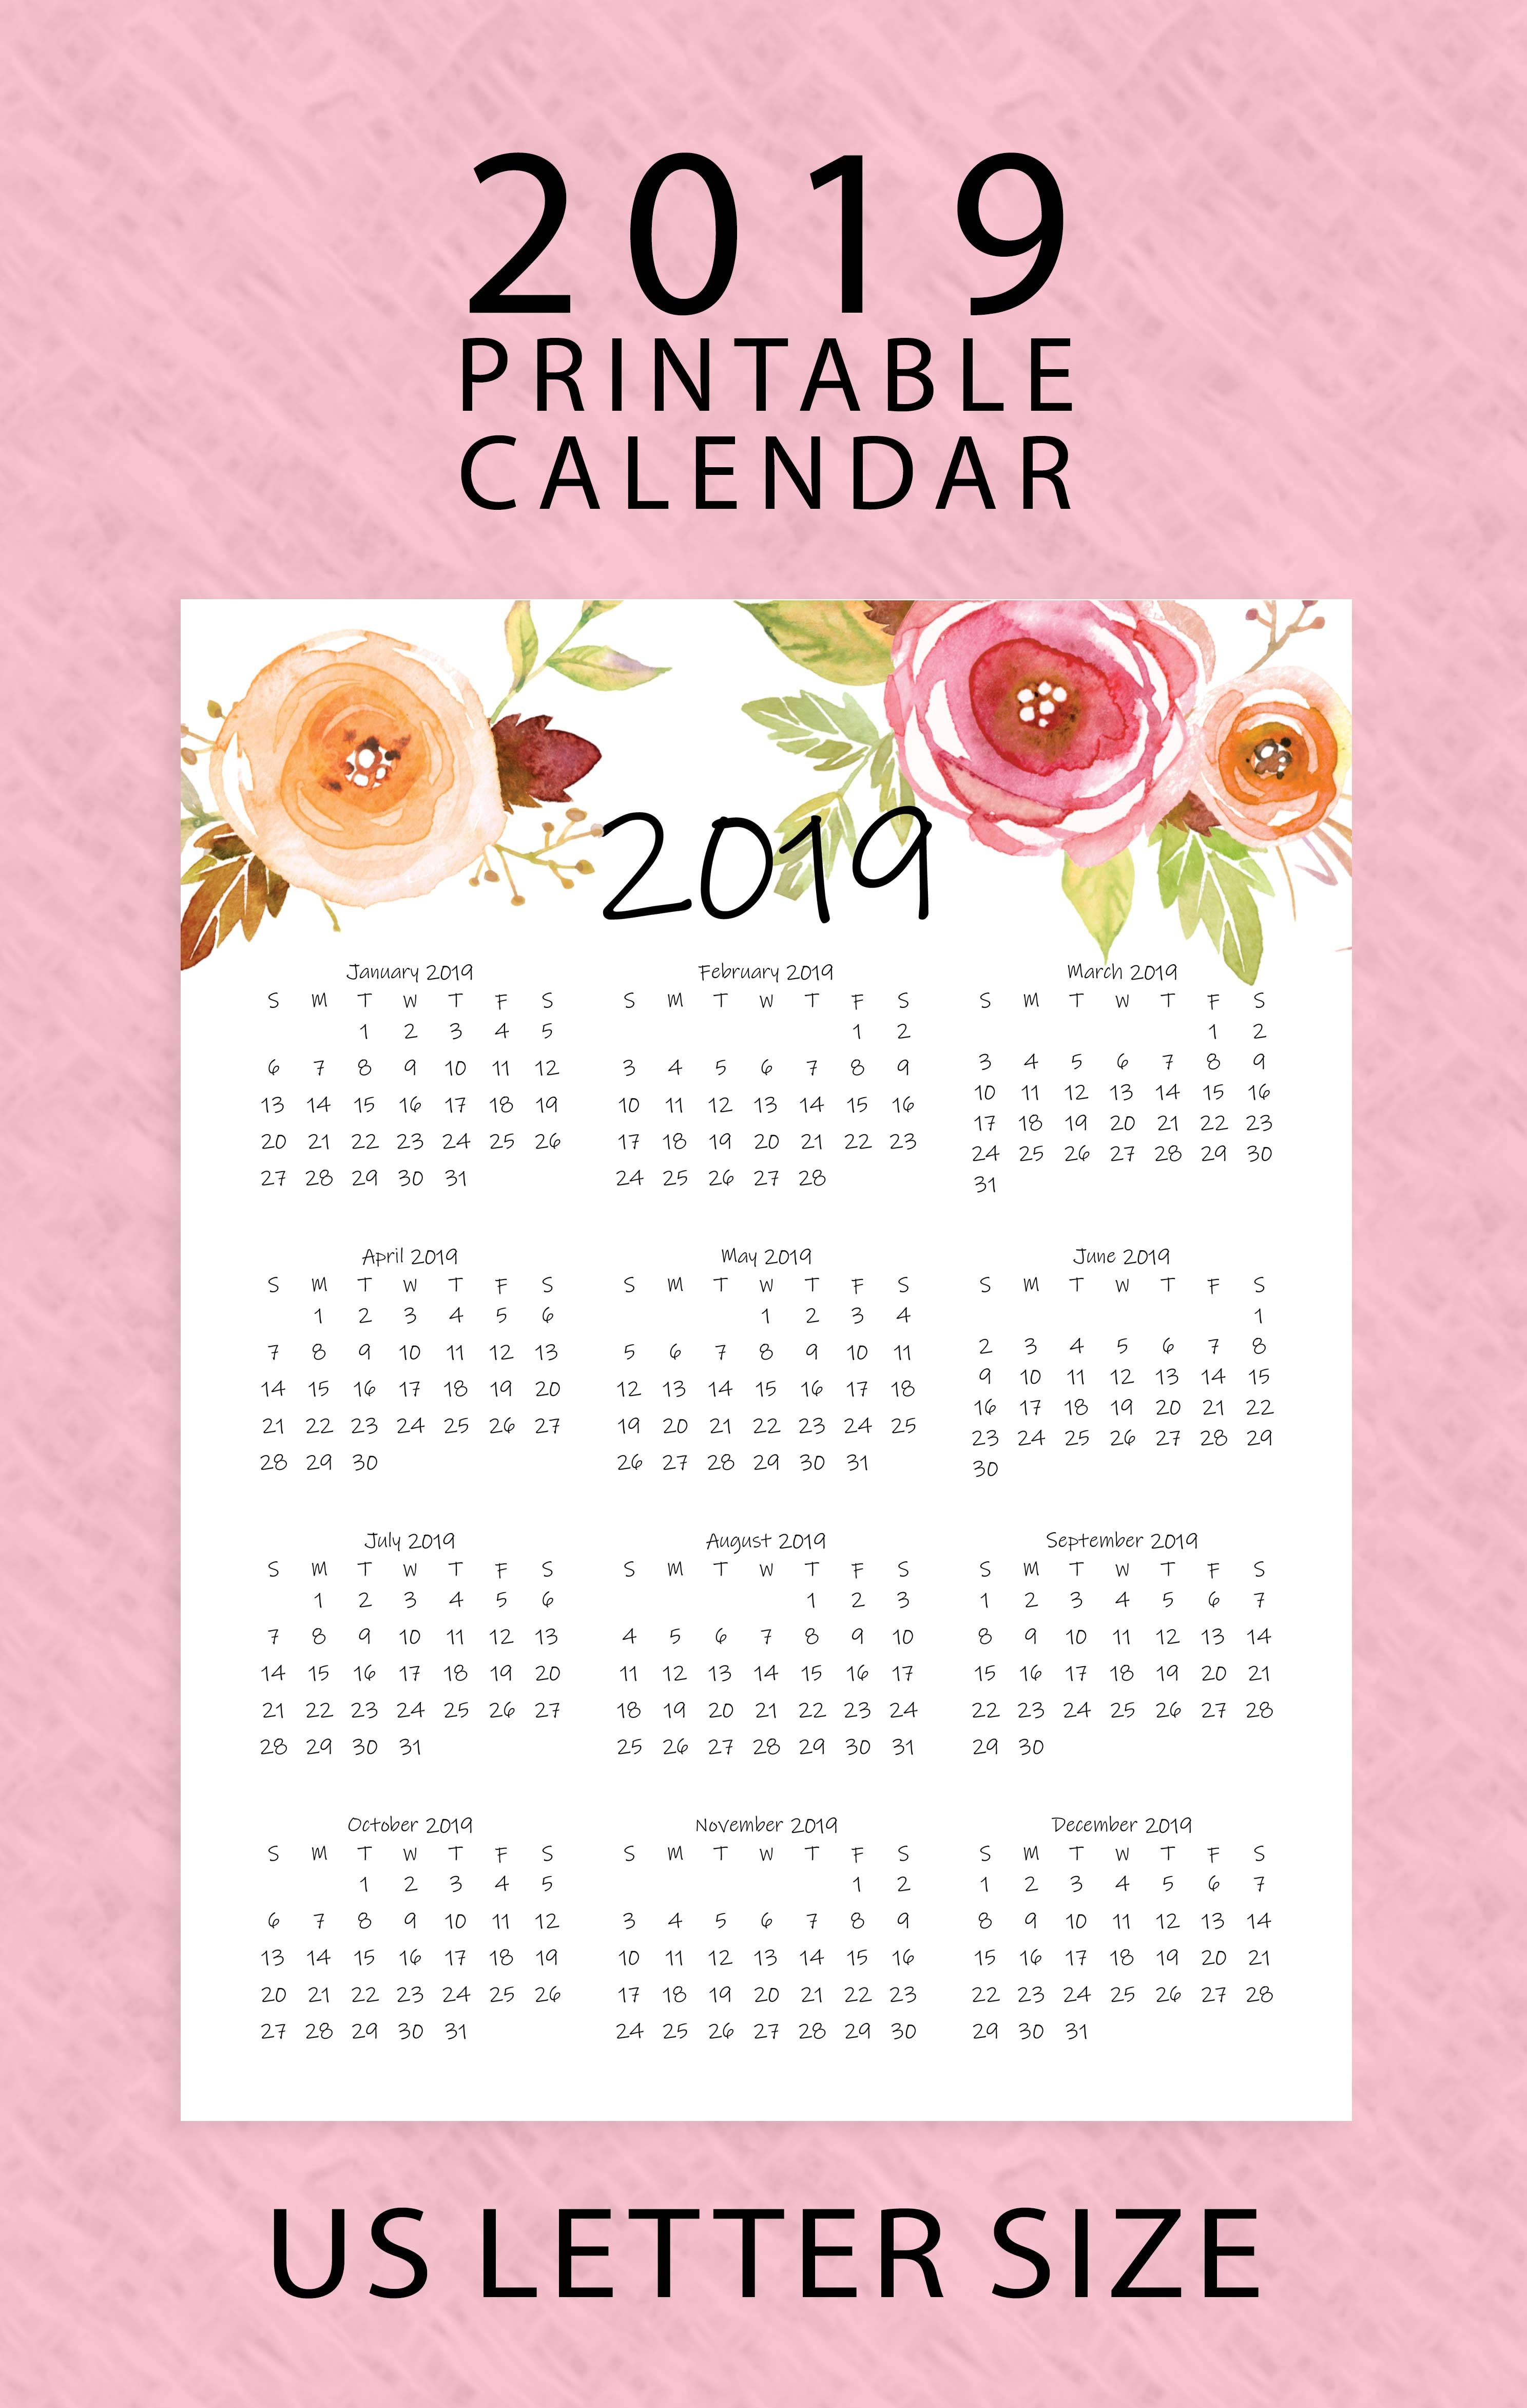 Year At A Glance Calendar 2019 | Printable Calendar | Letter